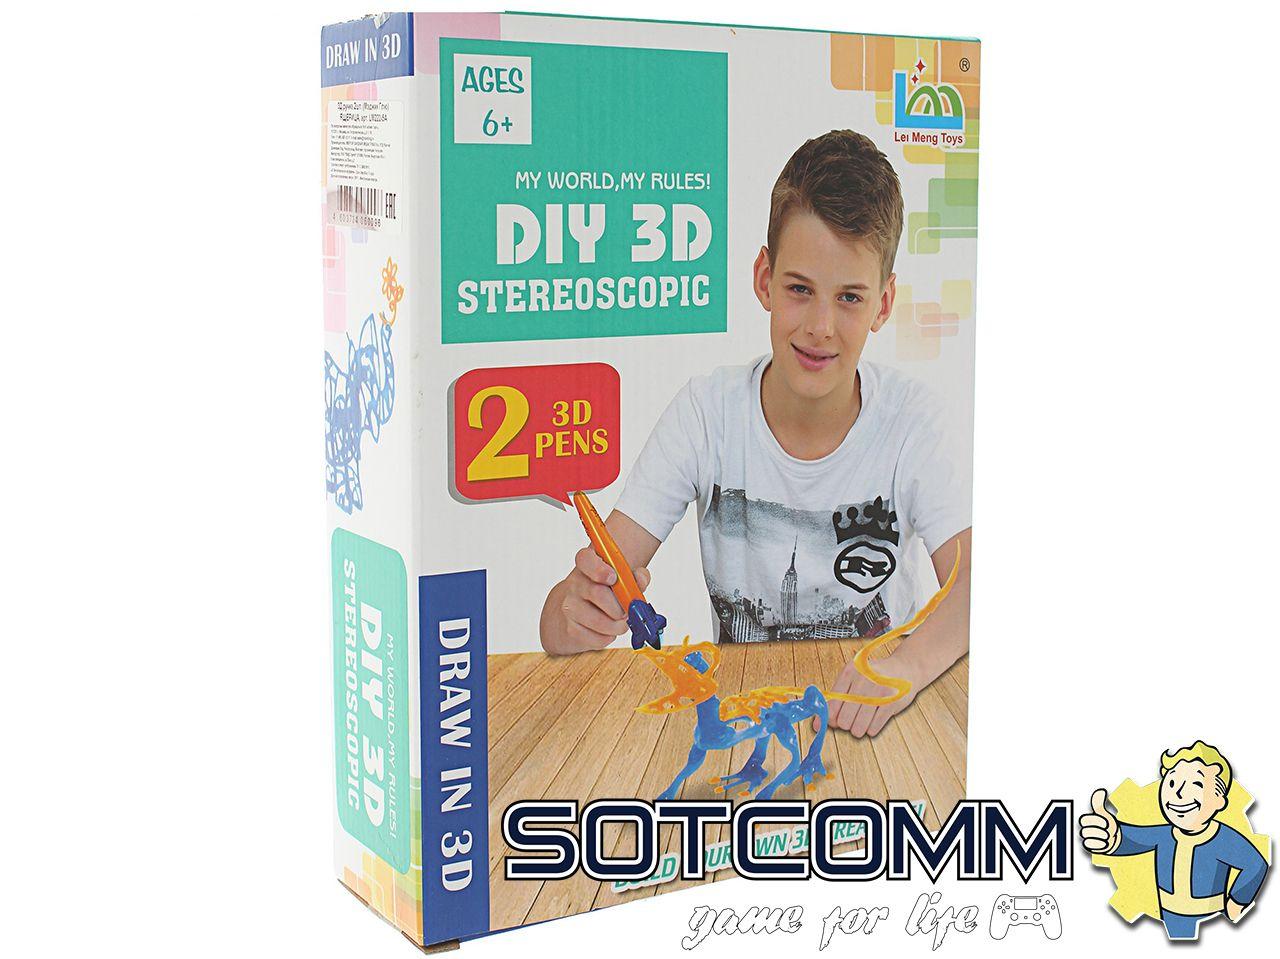 3D ручка Diy 3D Stereoscopic набор 2 ручки ОПТОМ